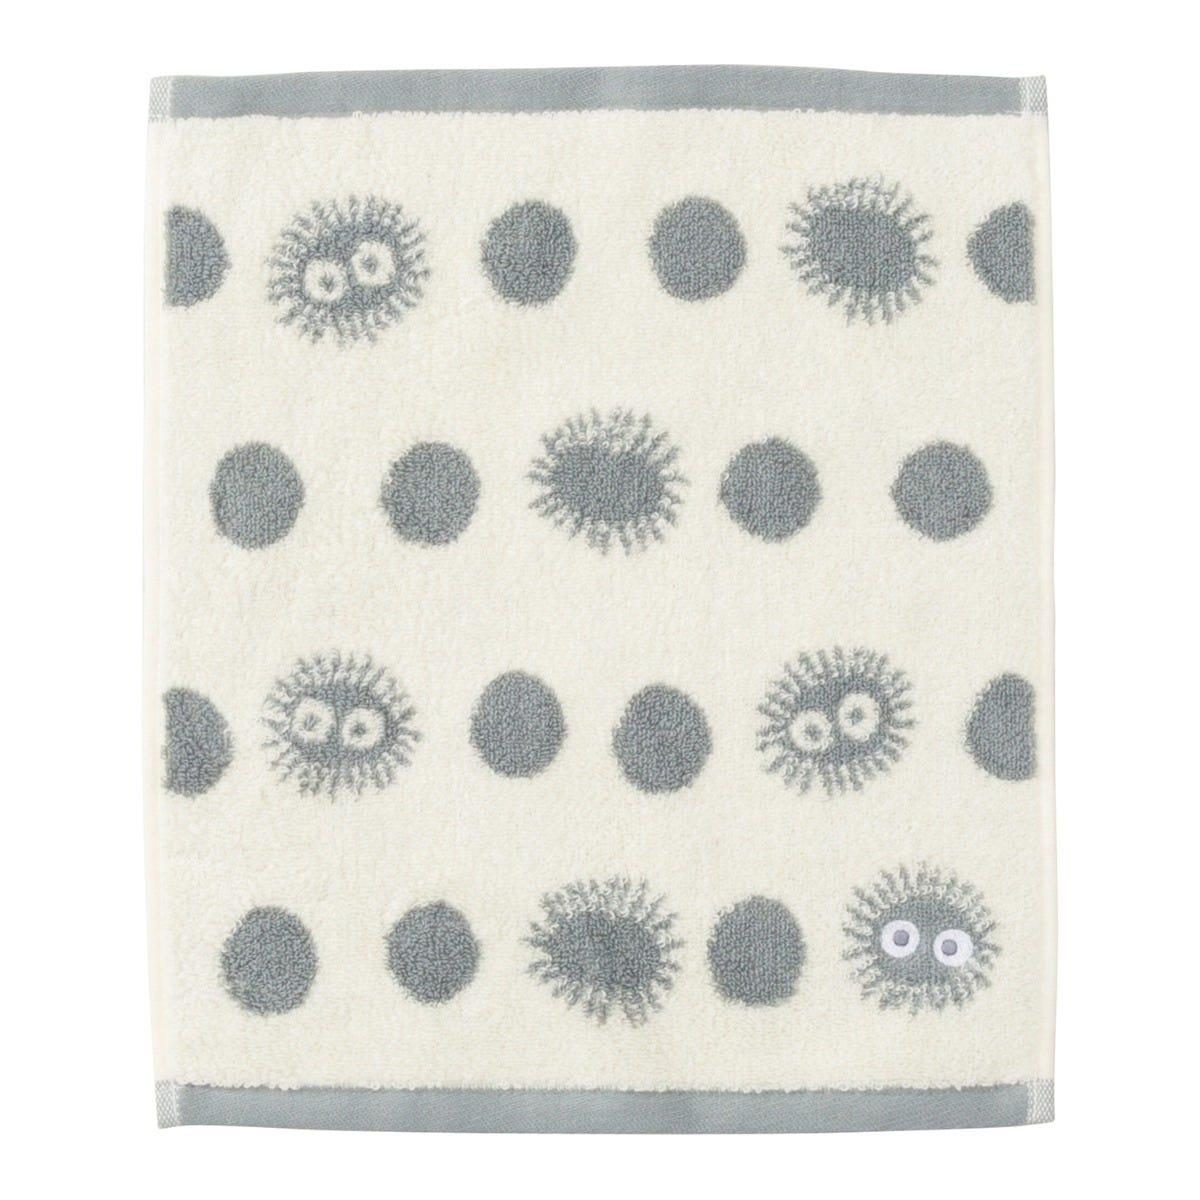 "Marushin Studio Ghibli Silhouette Towel Series Soot Sprite - (Wash Towel) ""My Neighbor Totoro"", Size: 13"" x 14.17"""